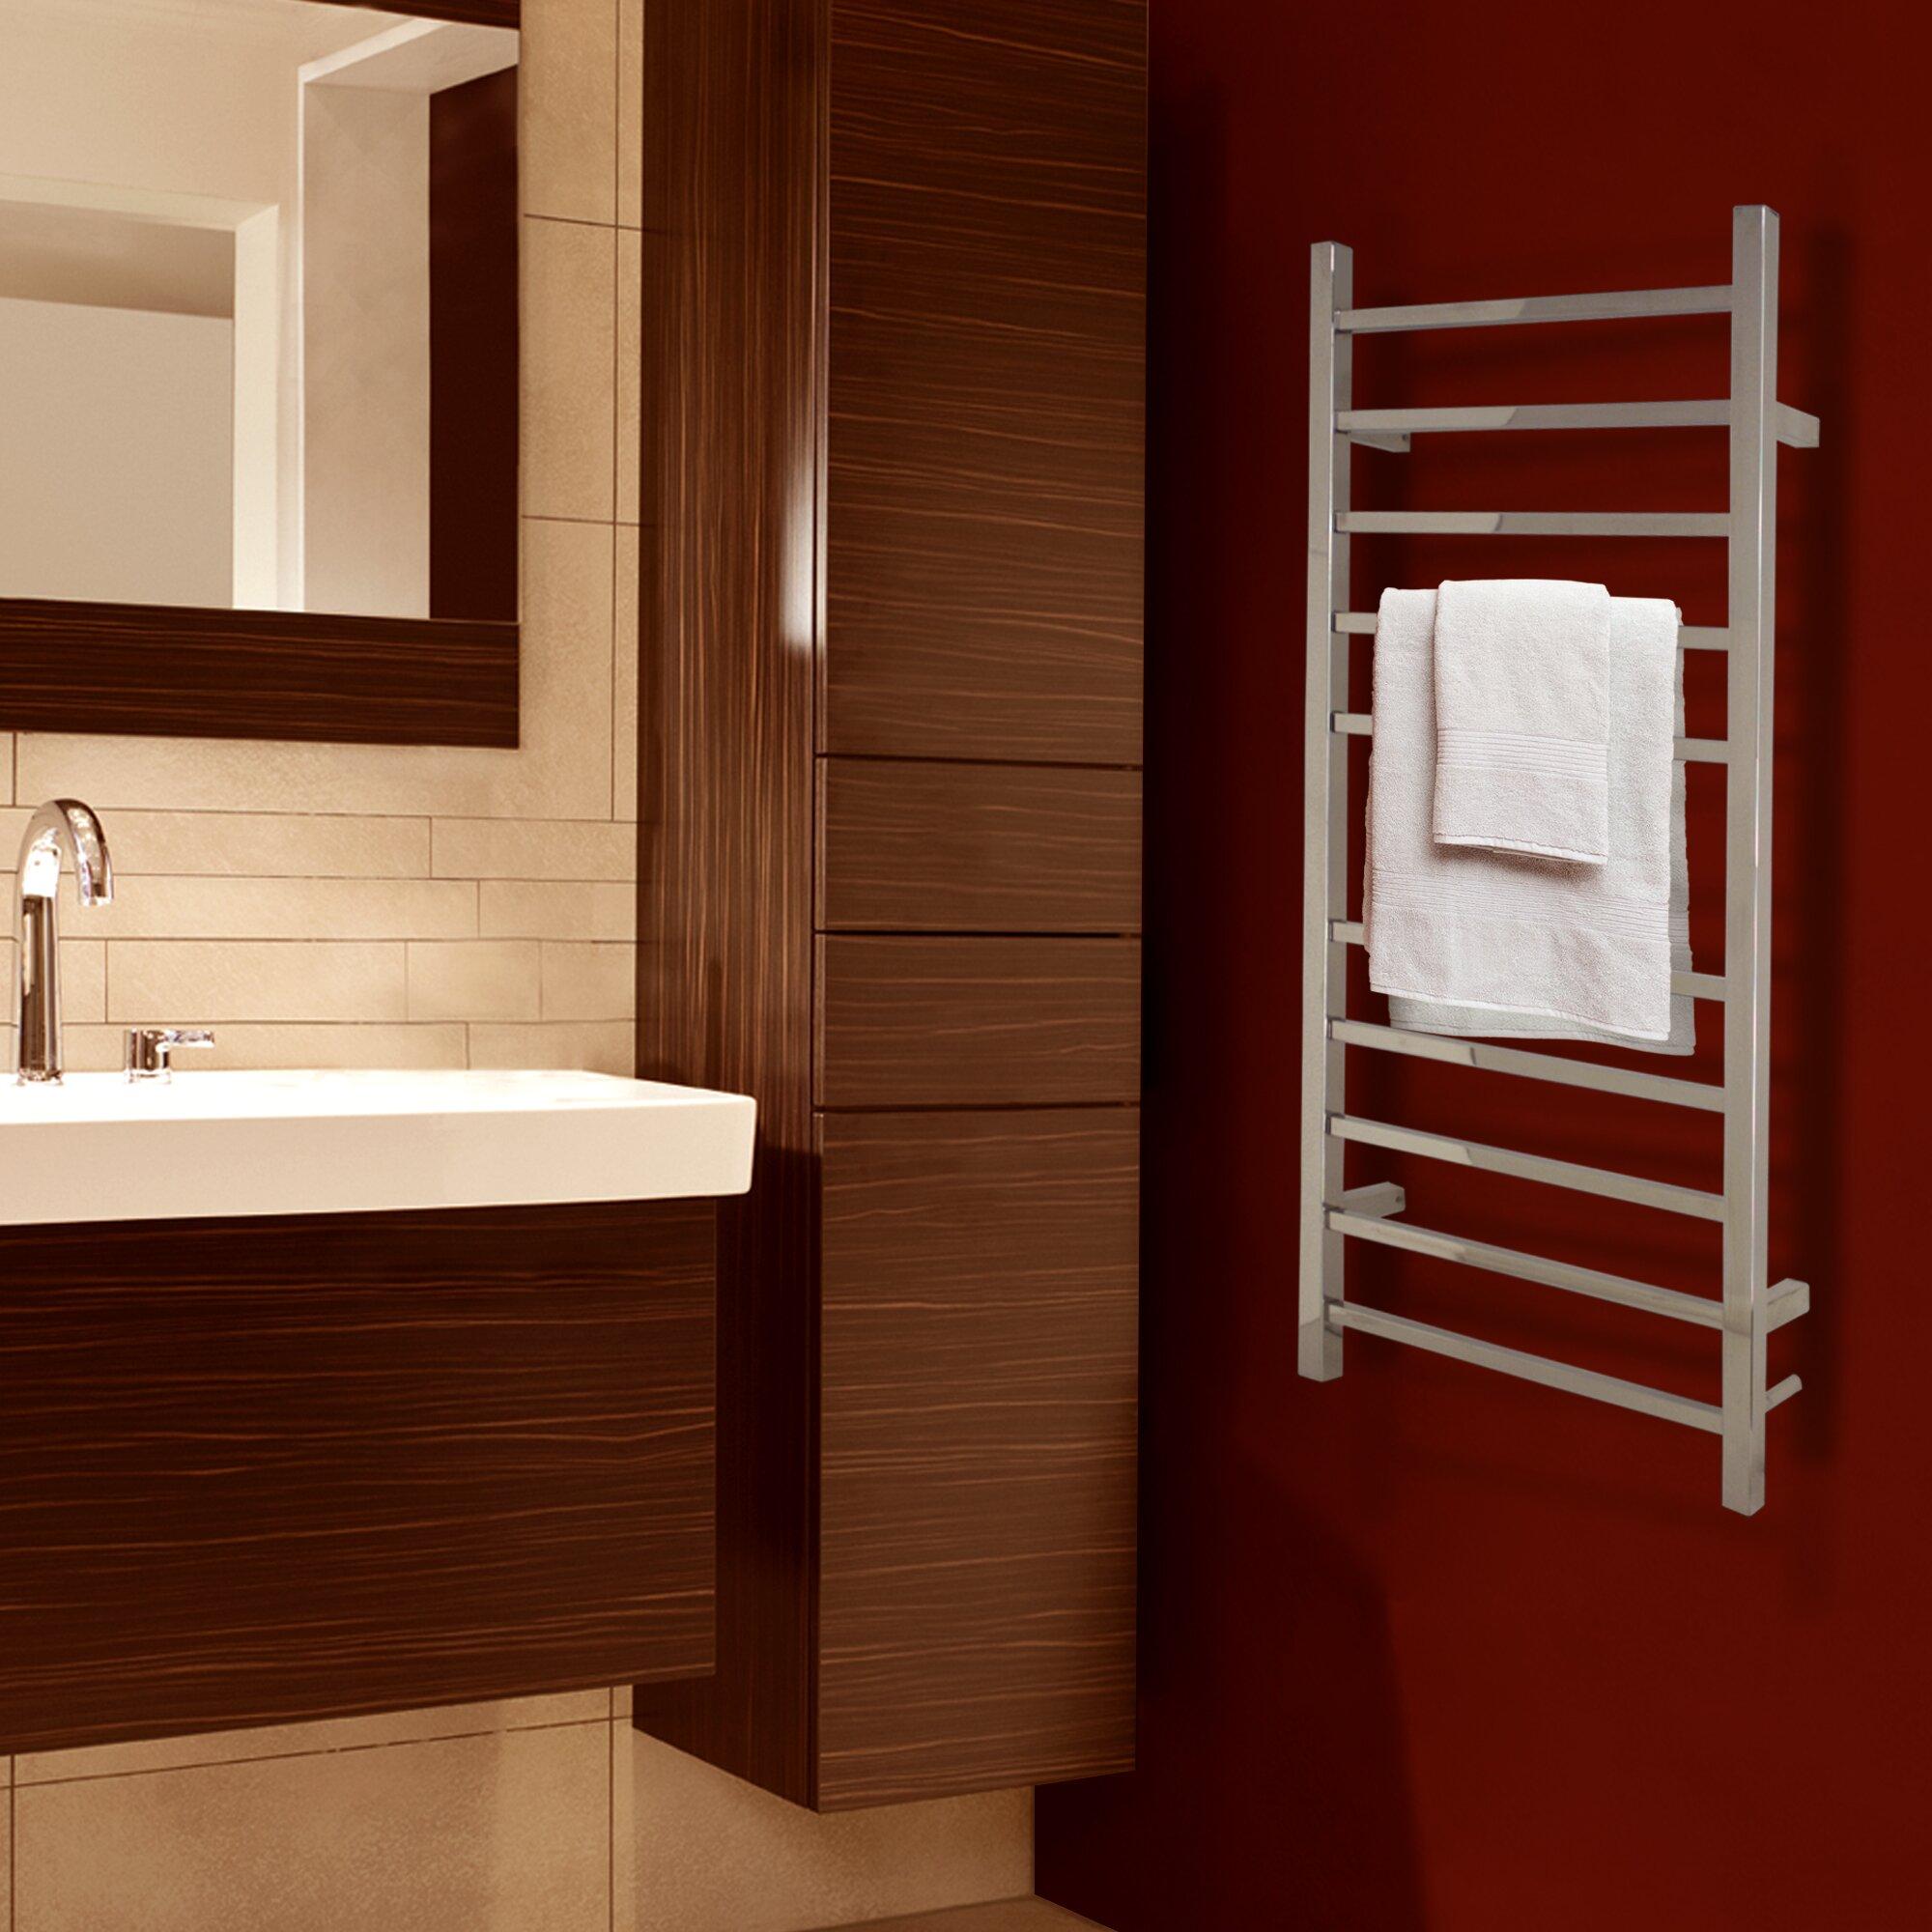 Warmlyyours Metropolitan Wall Mount Electric Towel Warmer